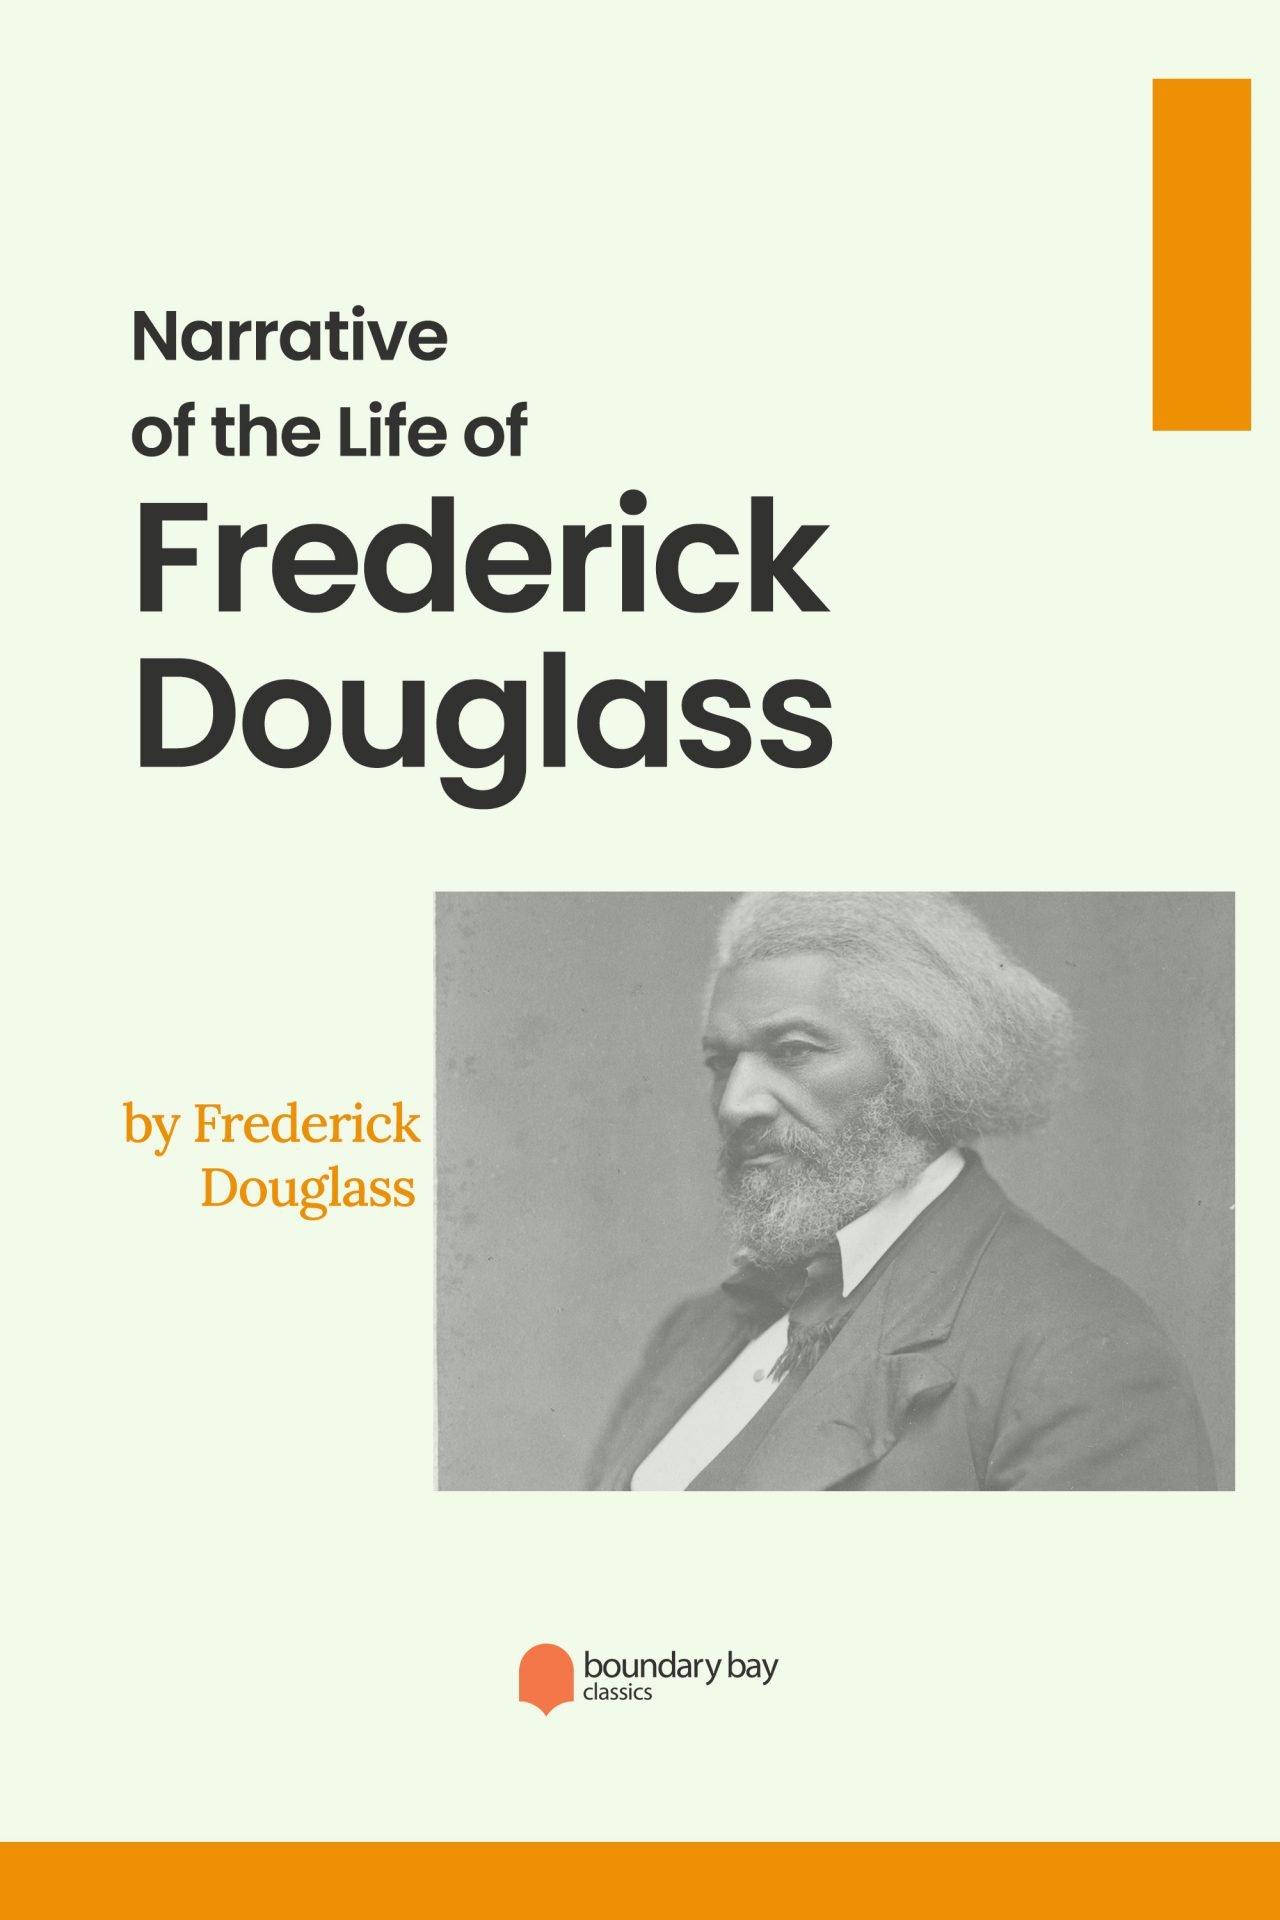 Print_and_Digital_Frederick Douglass